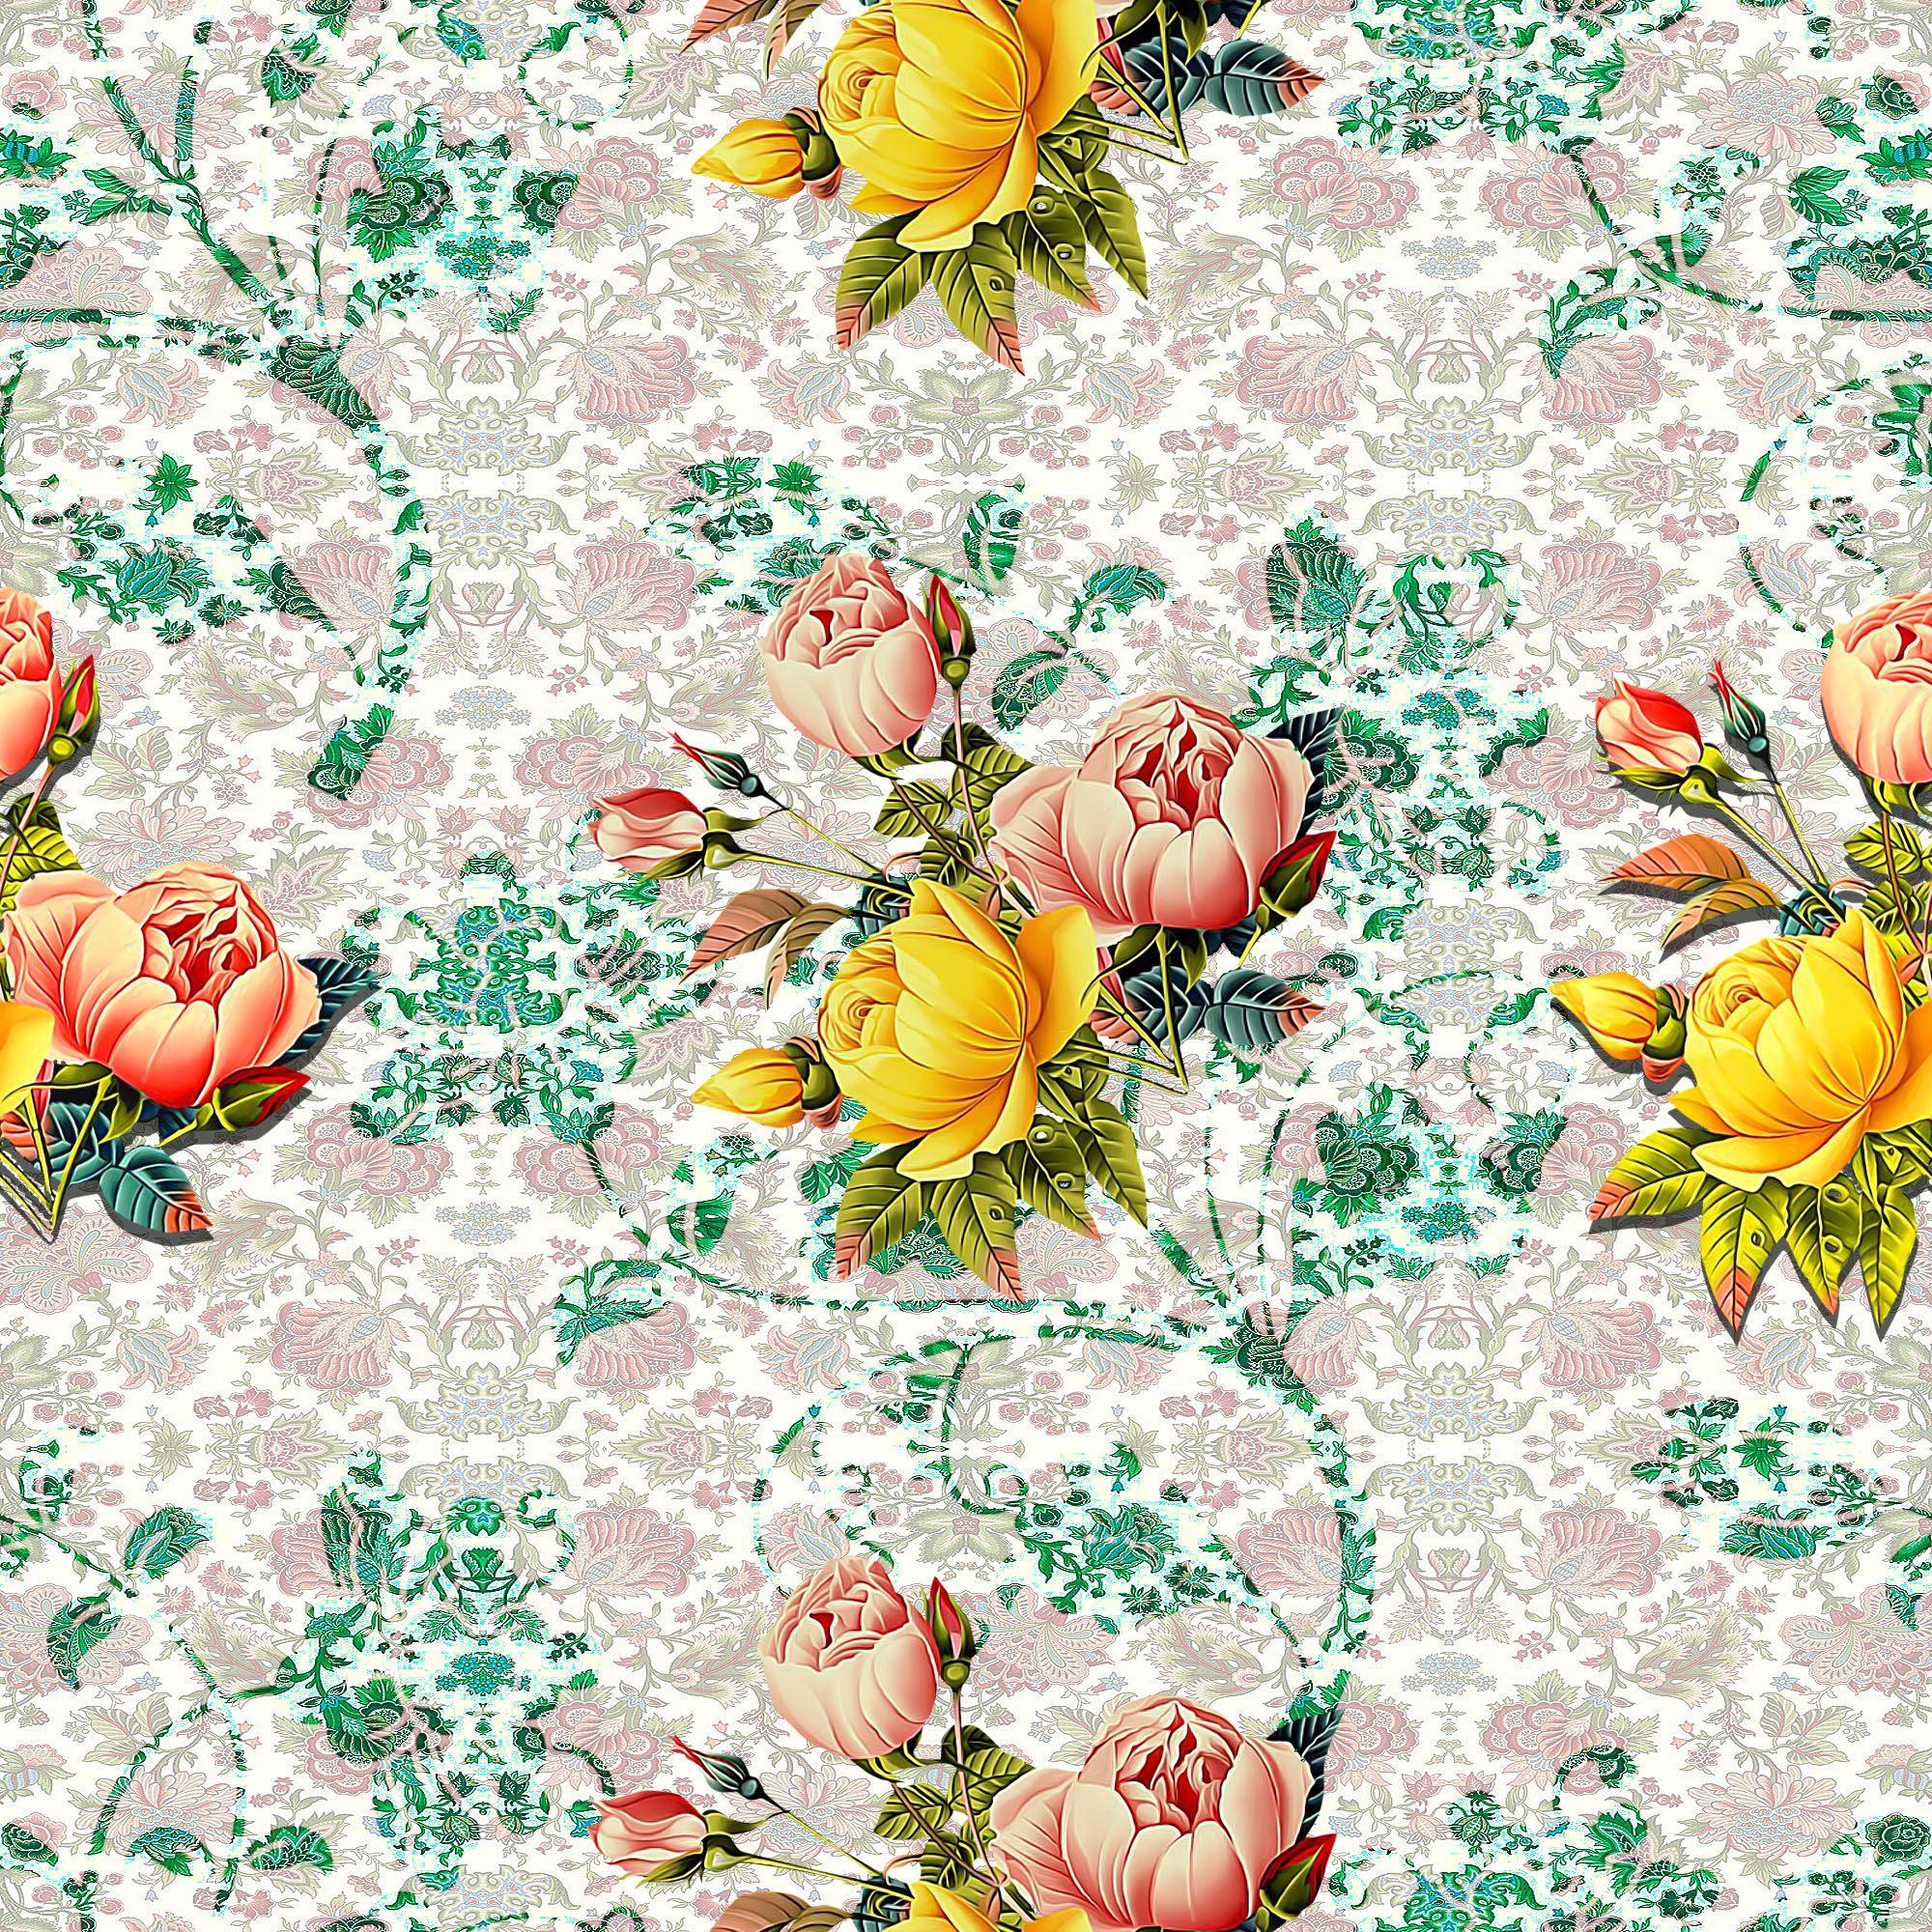 Pin By Designer Yuvraj On Flaw Victorian Flowers Flower